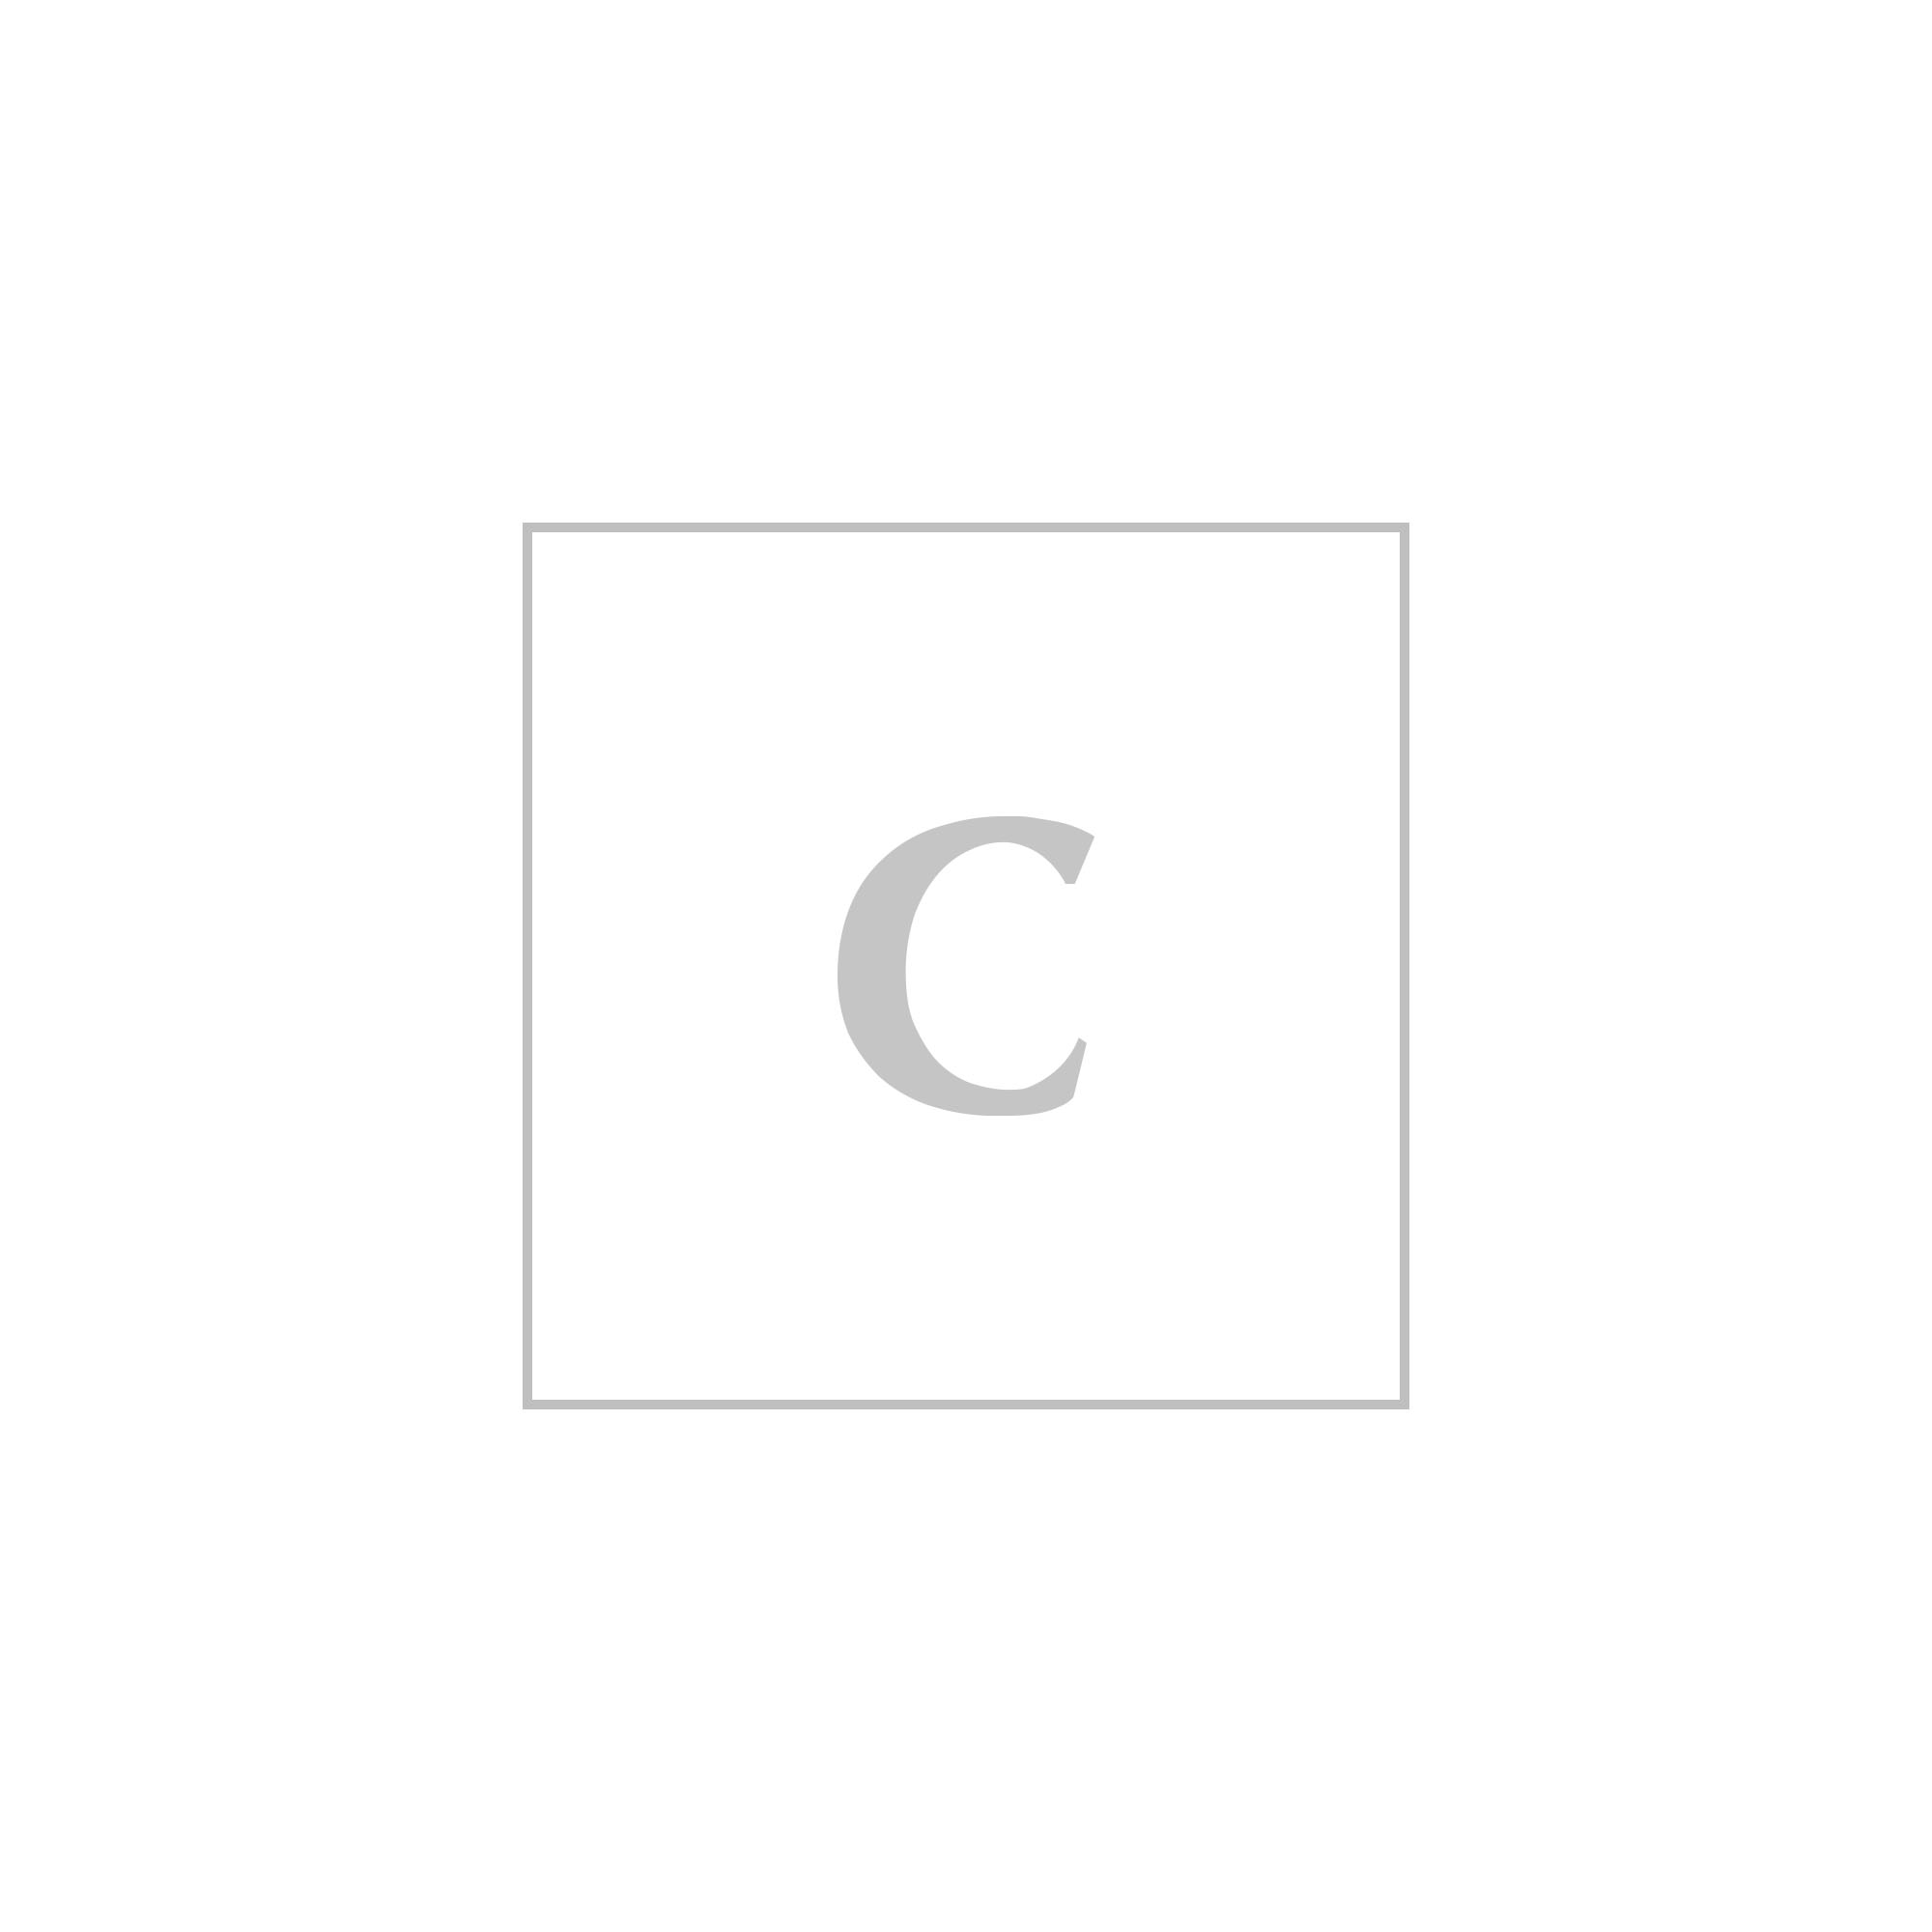 Moncler giubbotto bonite